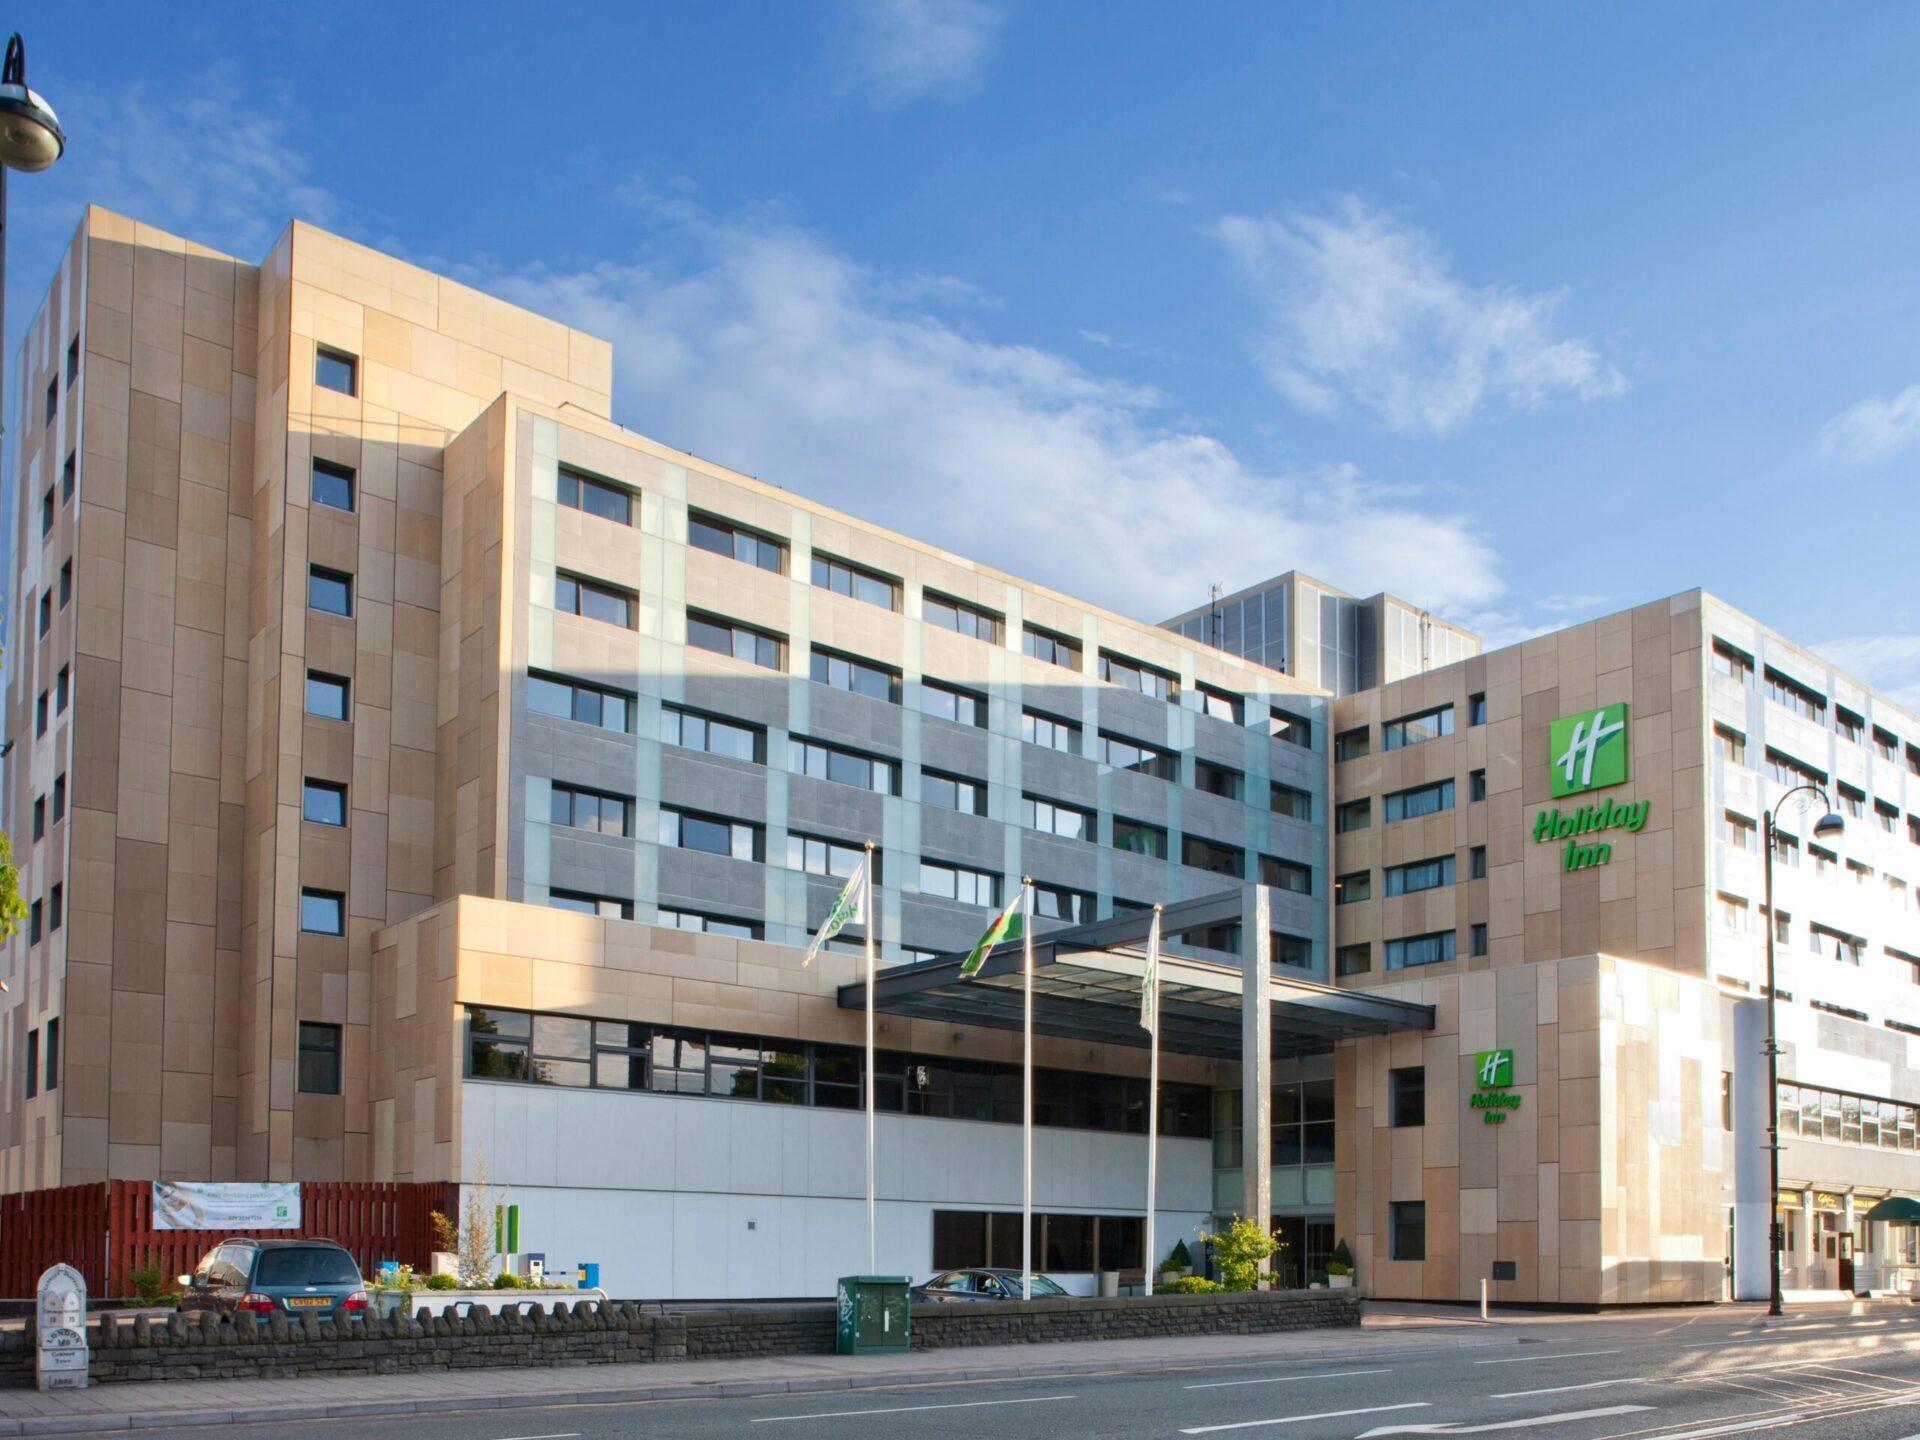 Cardiff - Holiday Inn - outside